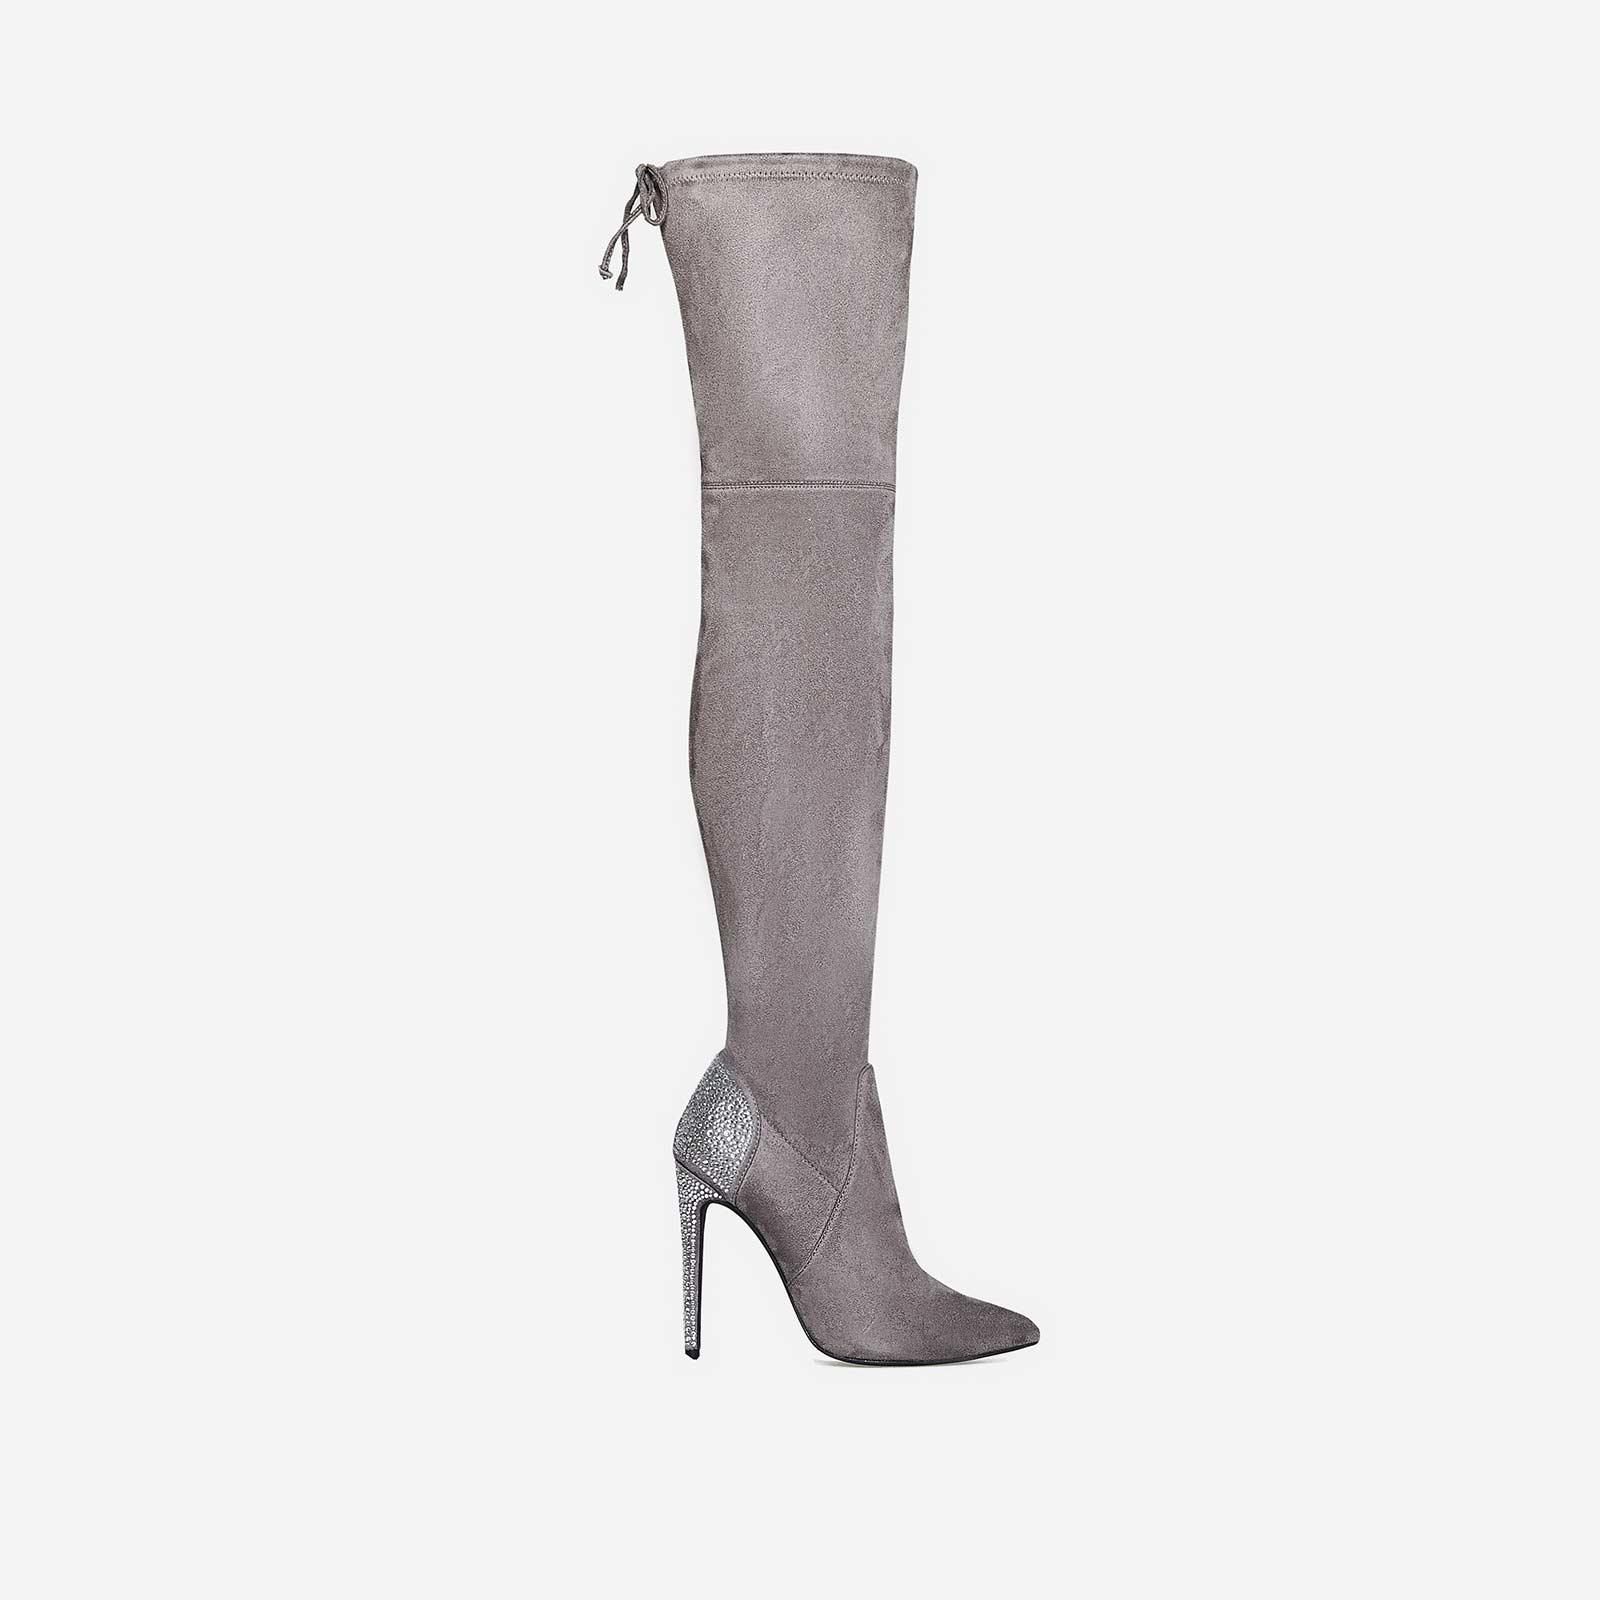 Myst Diamante Heel Long Boot In Grey Faux Suede